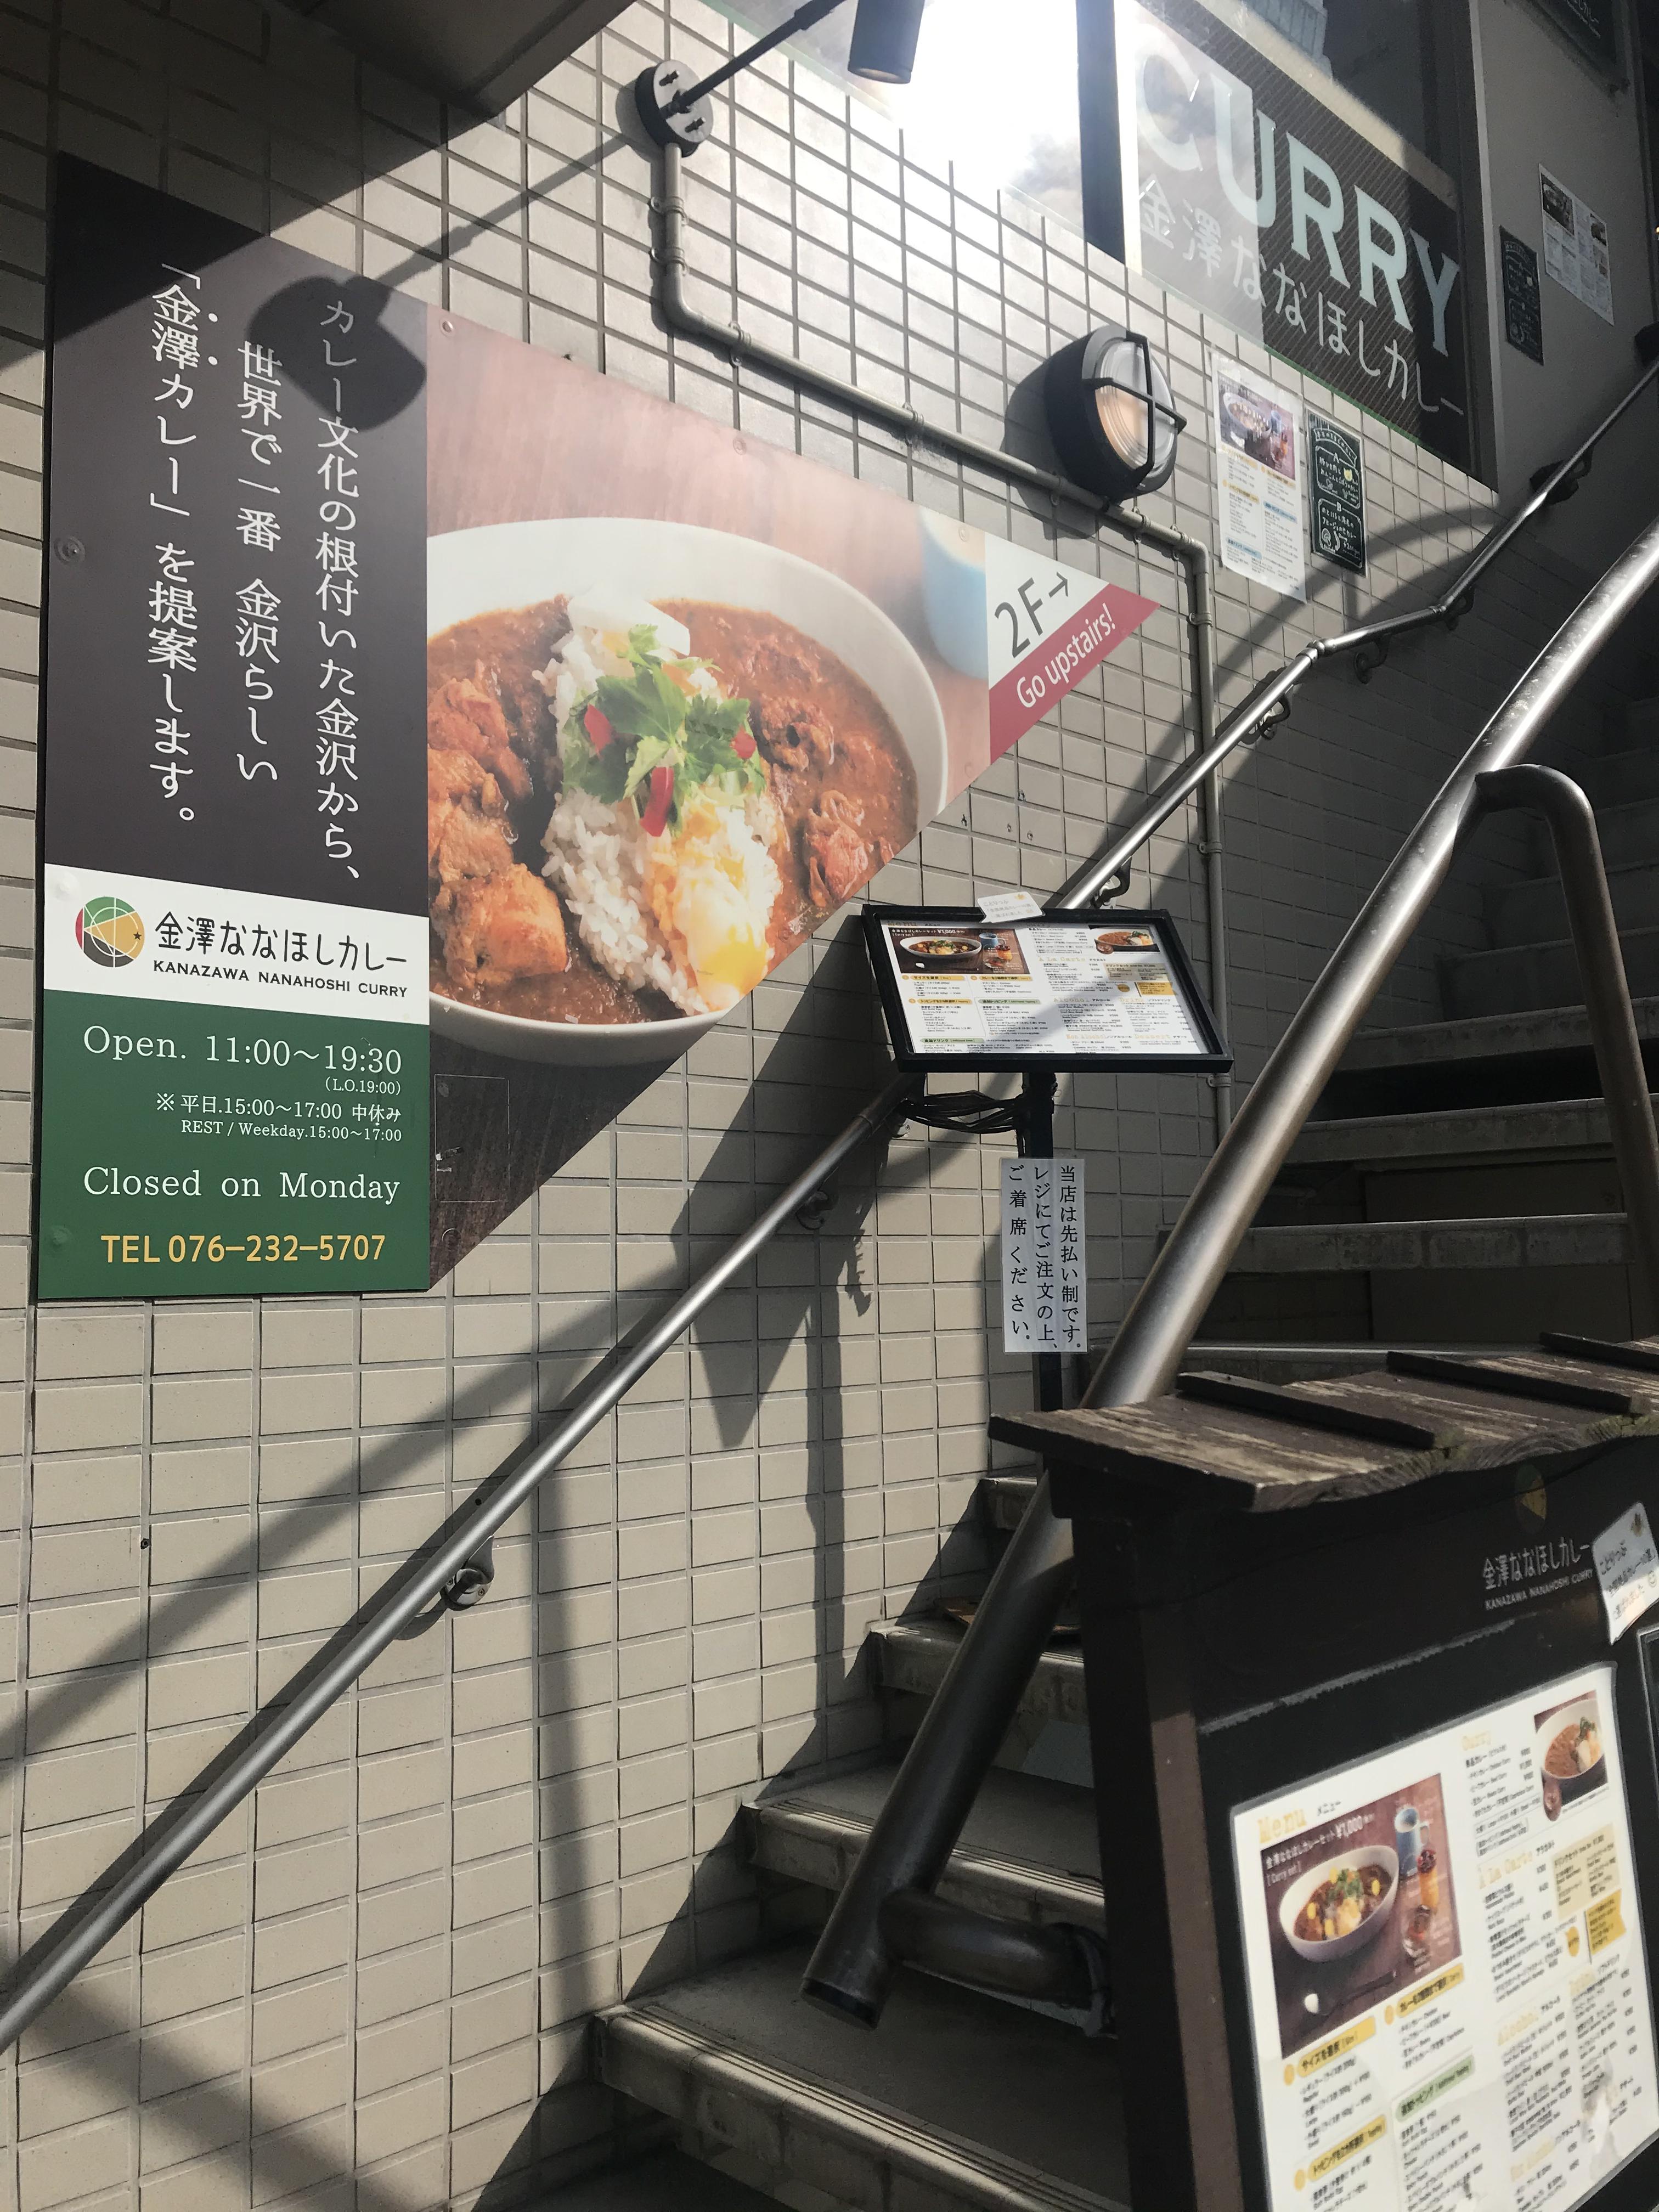 Nanahoshi Curry storefront in Hirosaka, Kanazawa, Japan